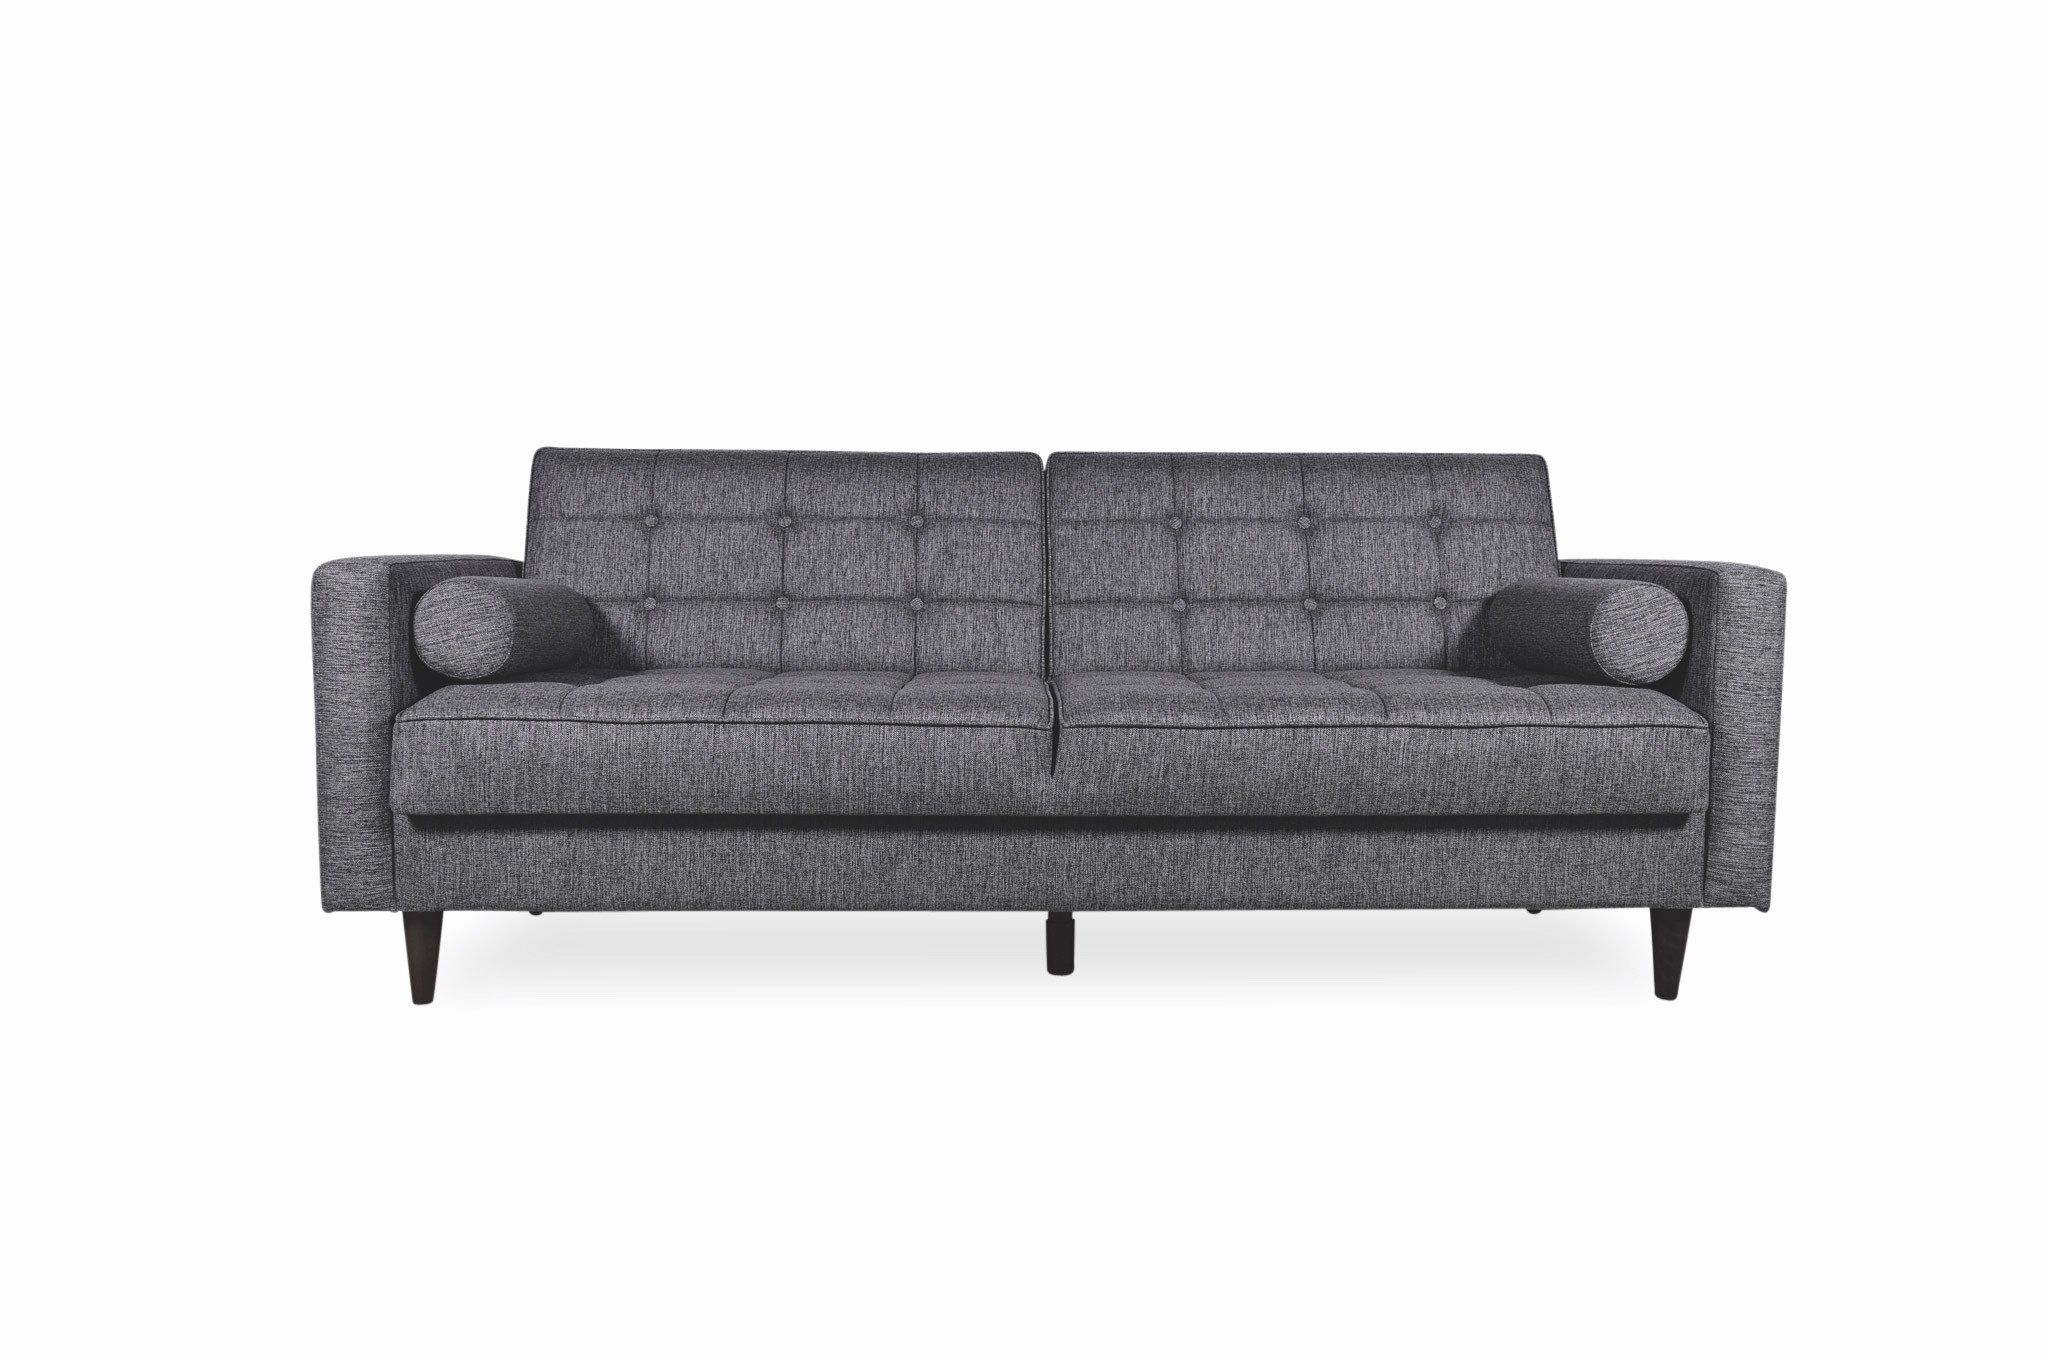 best of mid century modern sofa bed photographs mid century modern rh pinterest com queen sleeper sofa houston queen sleeper sofa houston